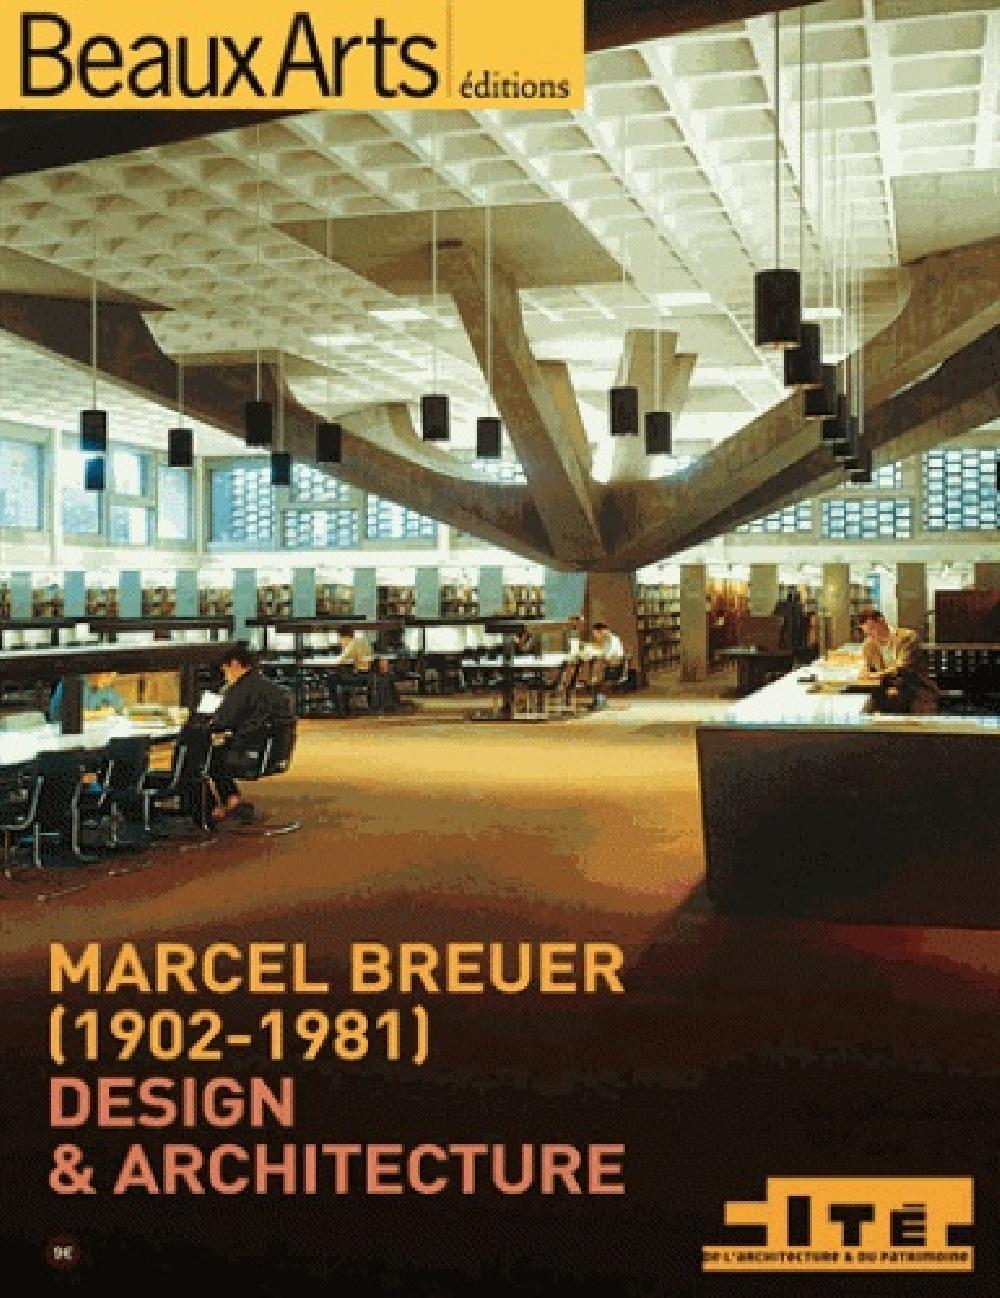 Marcel Breuer (1902-1981) - Design & architecture